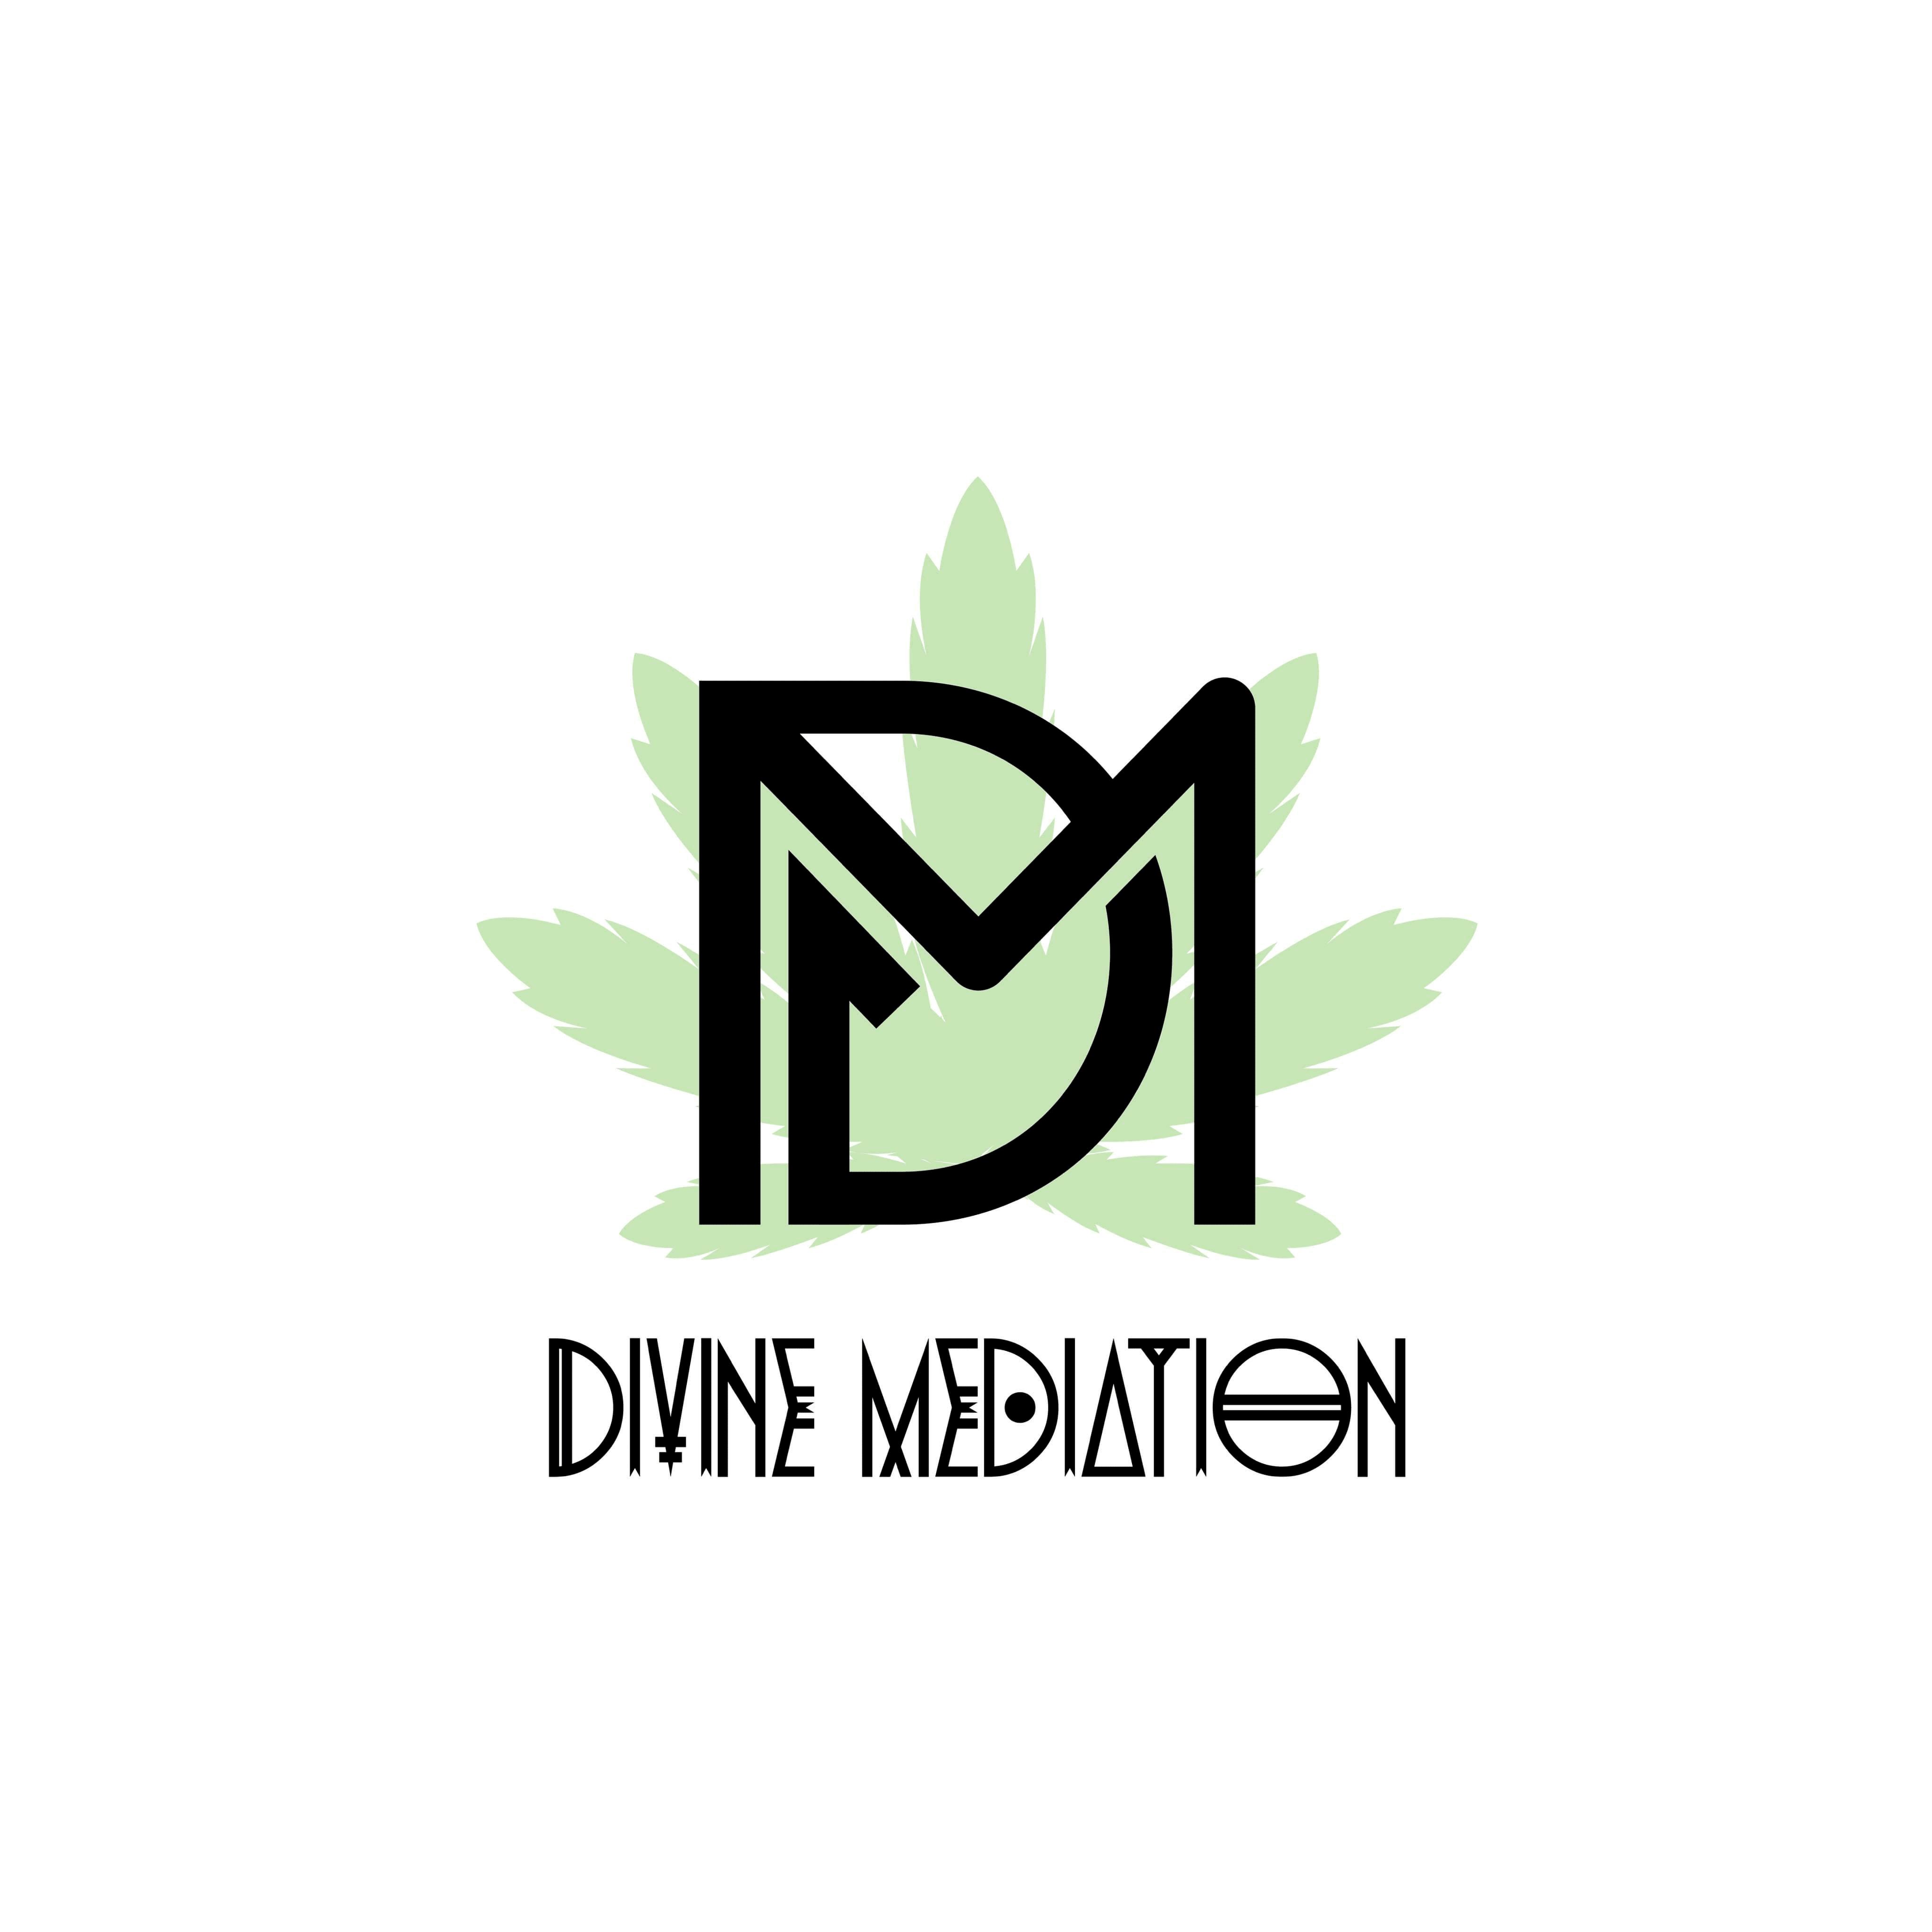 Divine Mediation